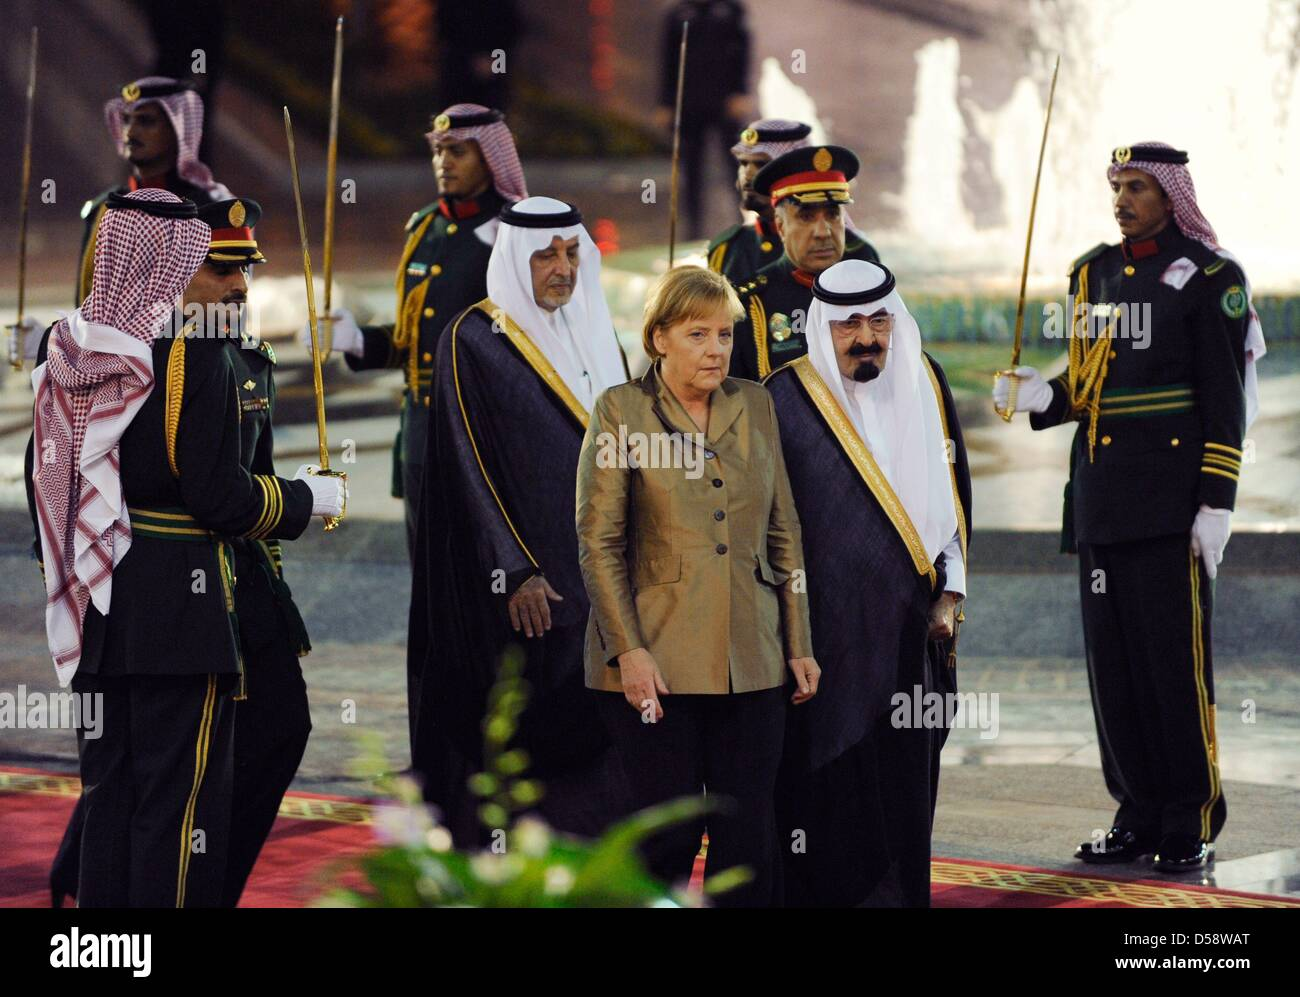 Bundeskanzlerin Angela Merkel (CDU) wird am Dienstag (25.05.2010) vor dem Palast des Königs in Djidda (Saudi Immagini Stock